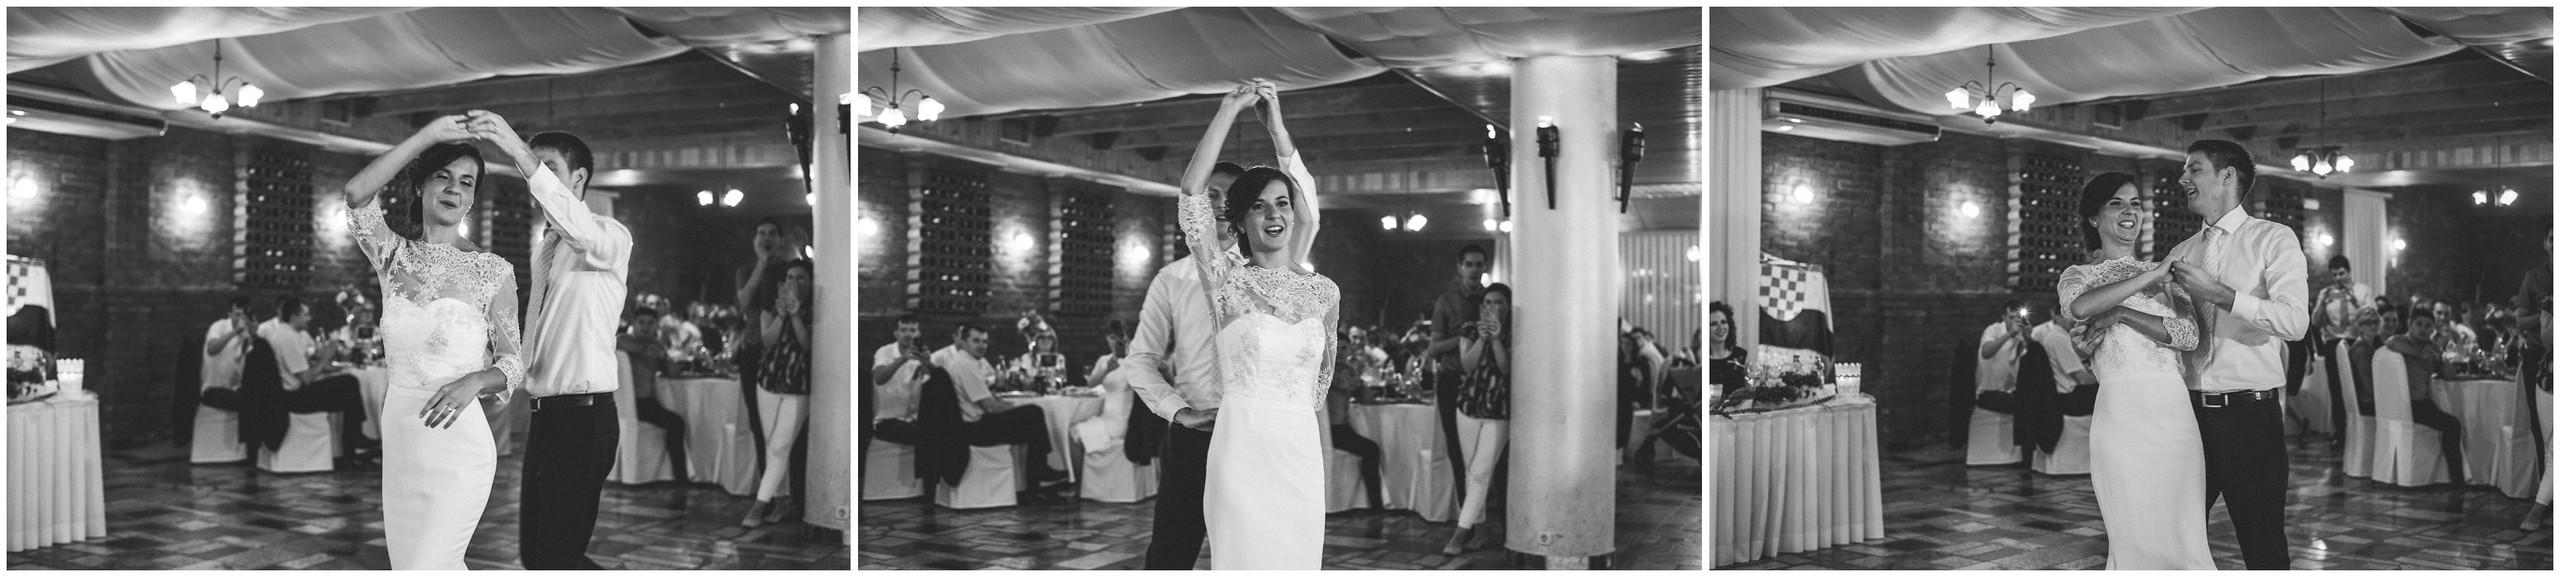 Prvi ples mladenaca